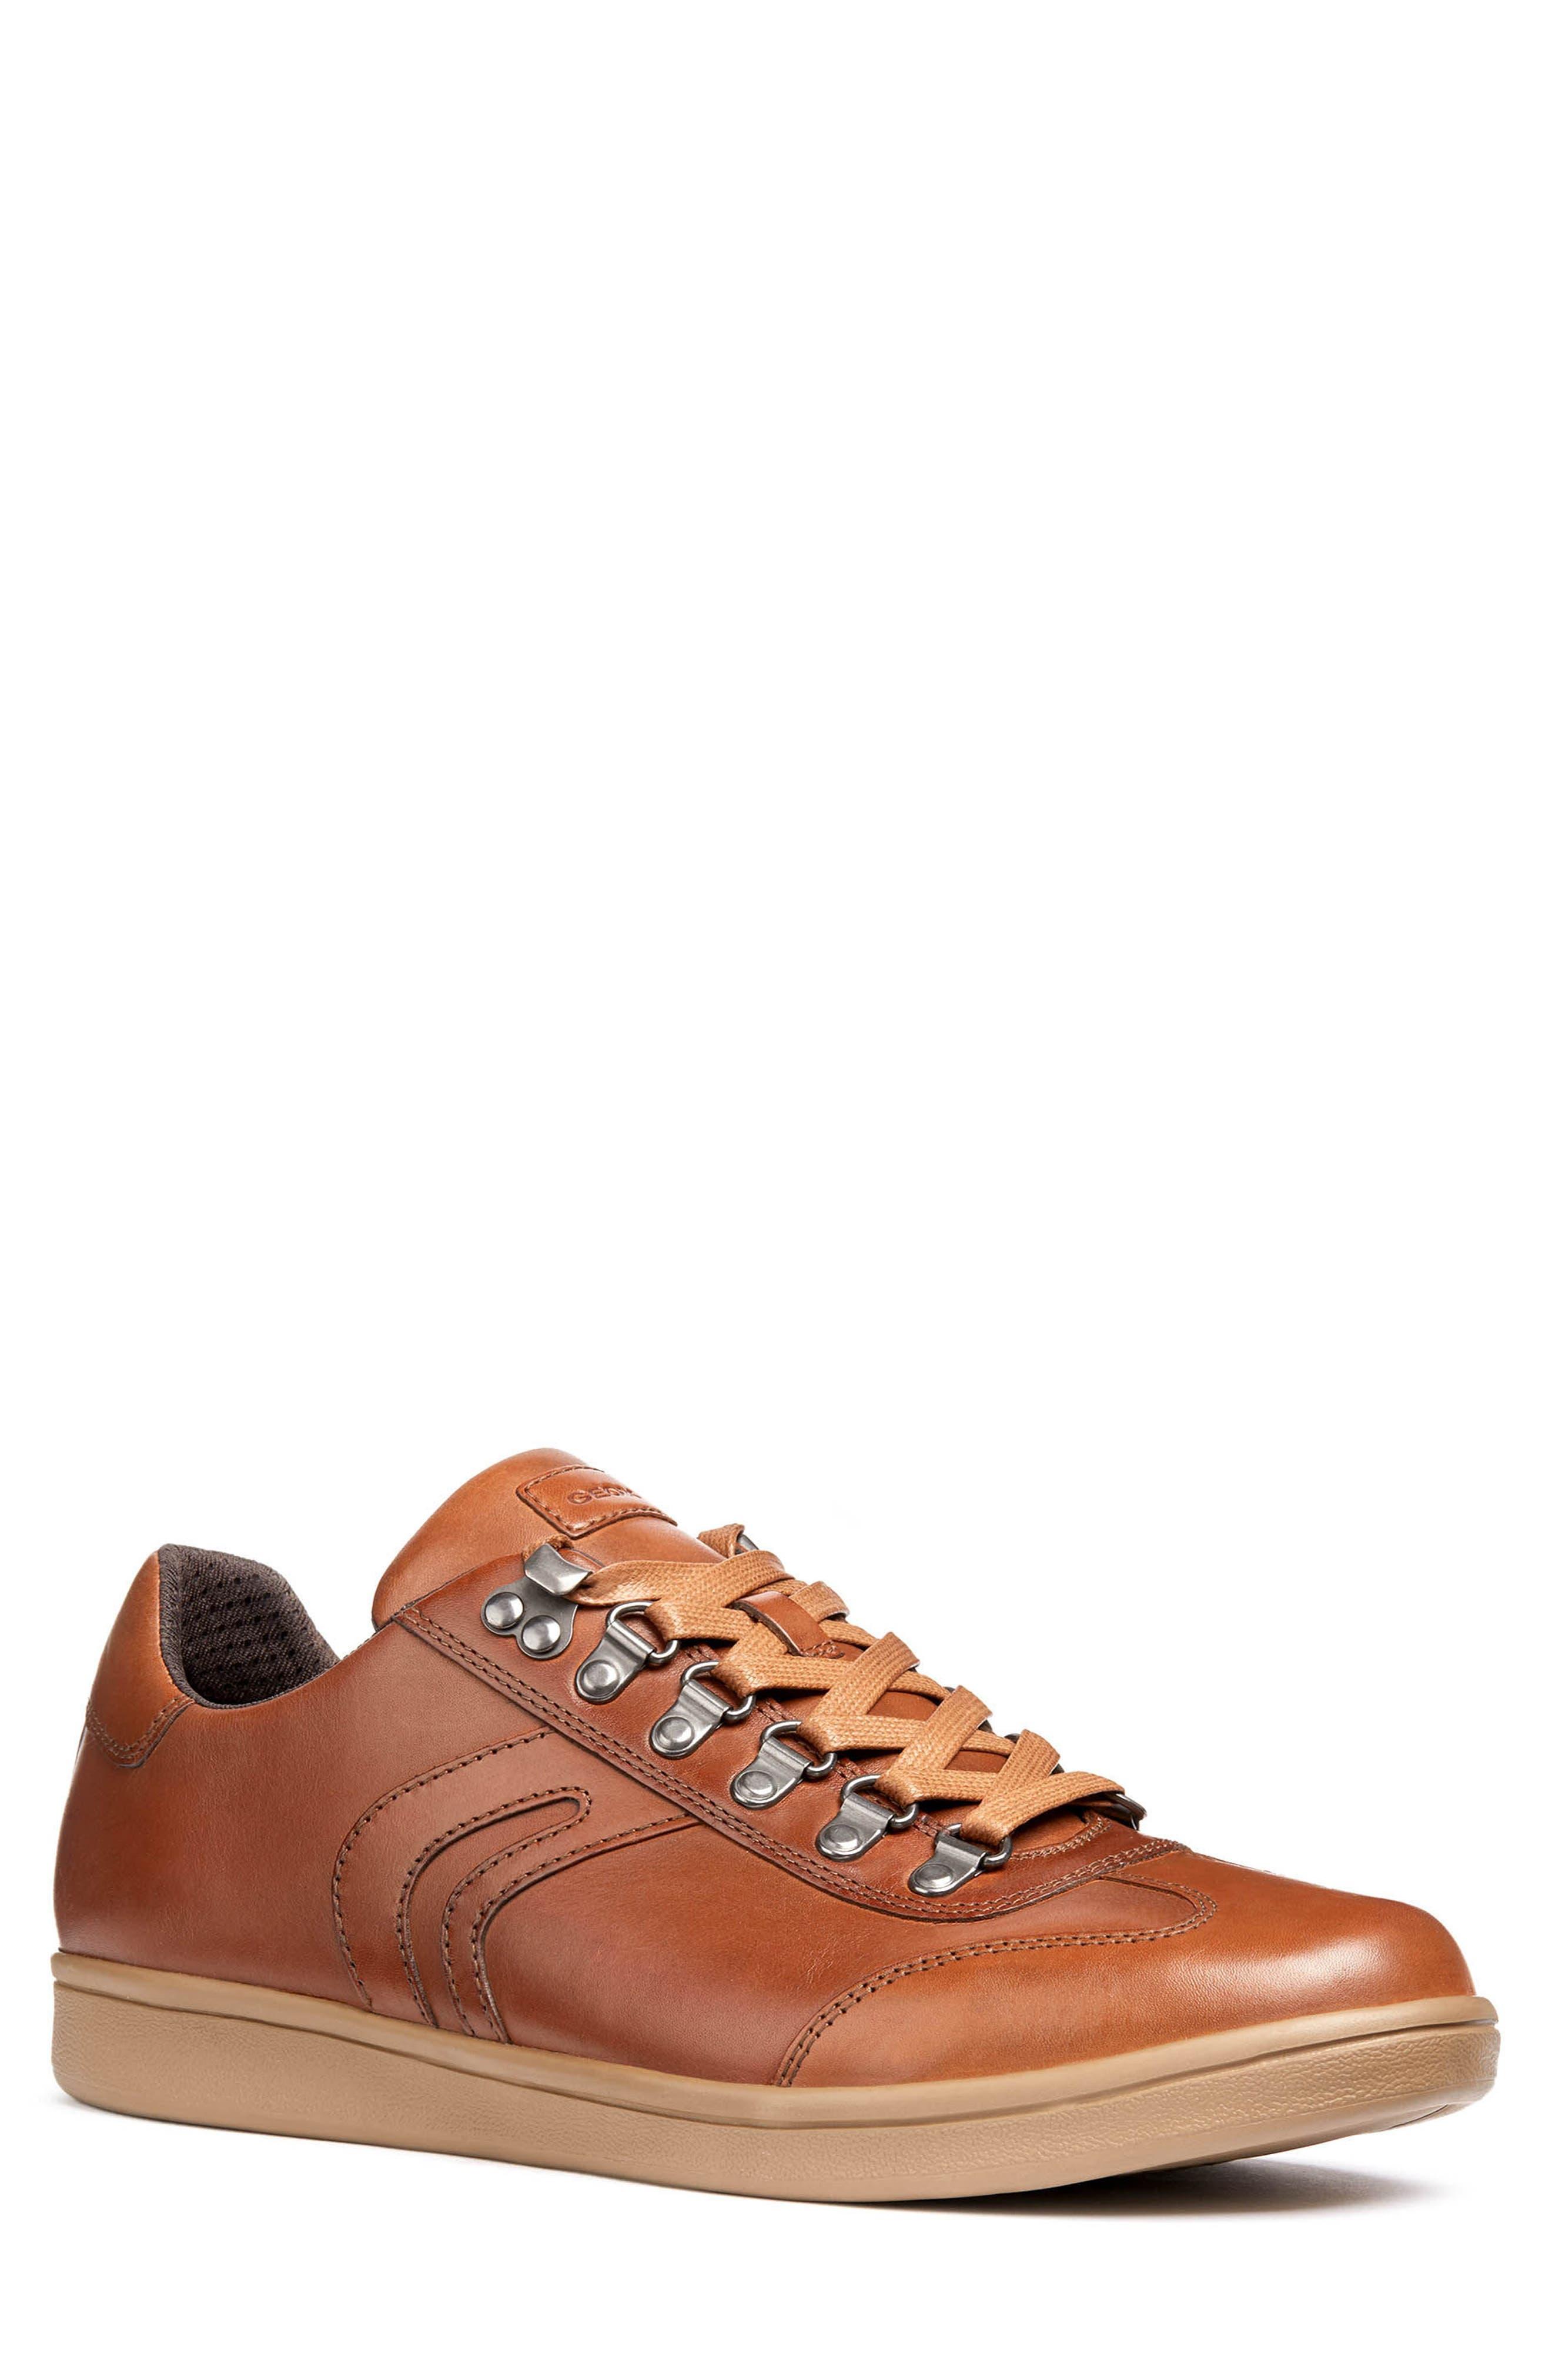 Geox Warrens 12 Low Top Sneaker, Brown